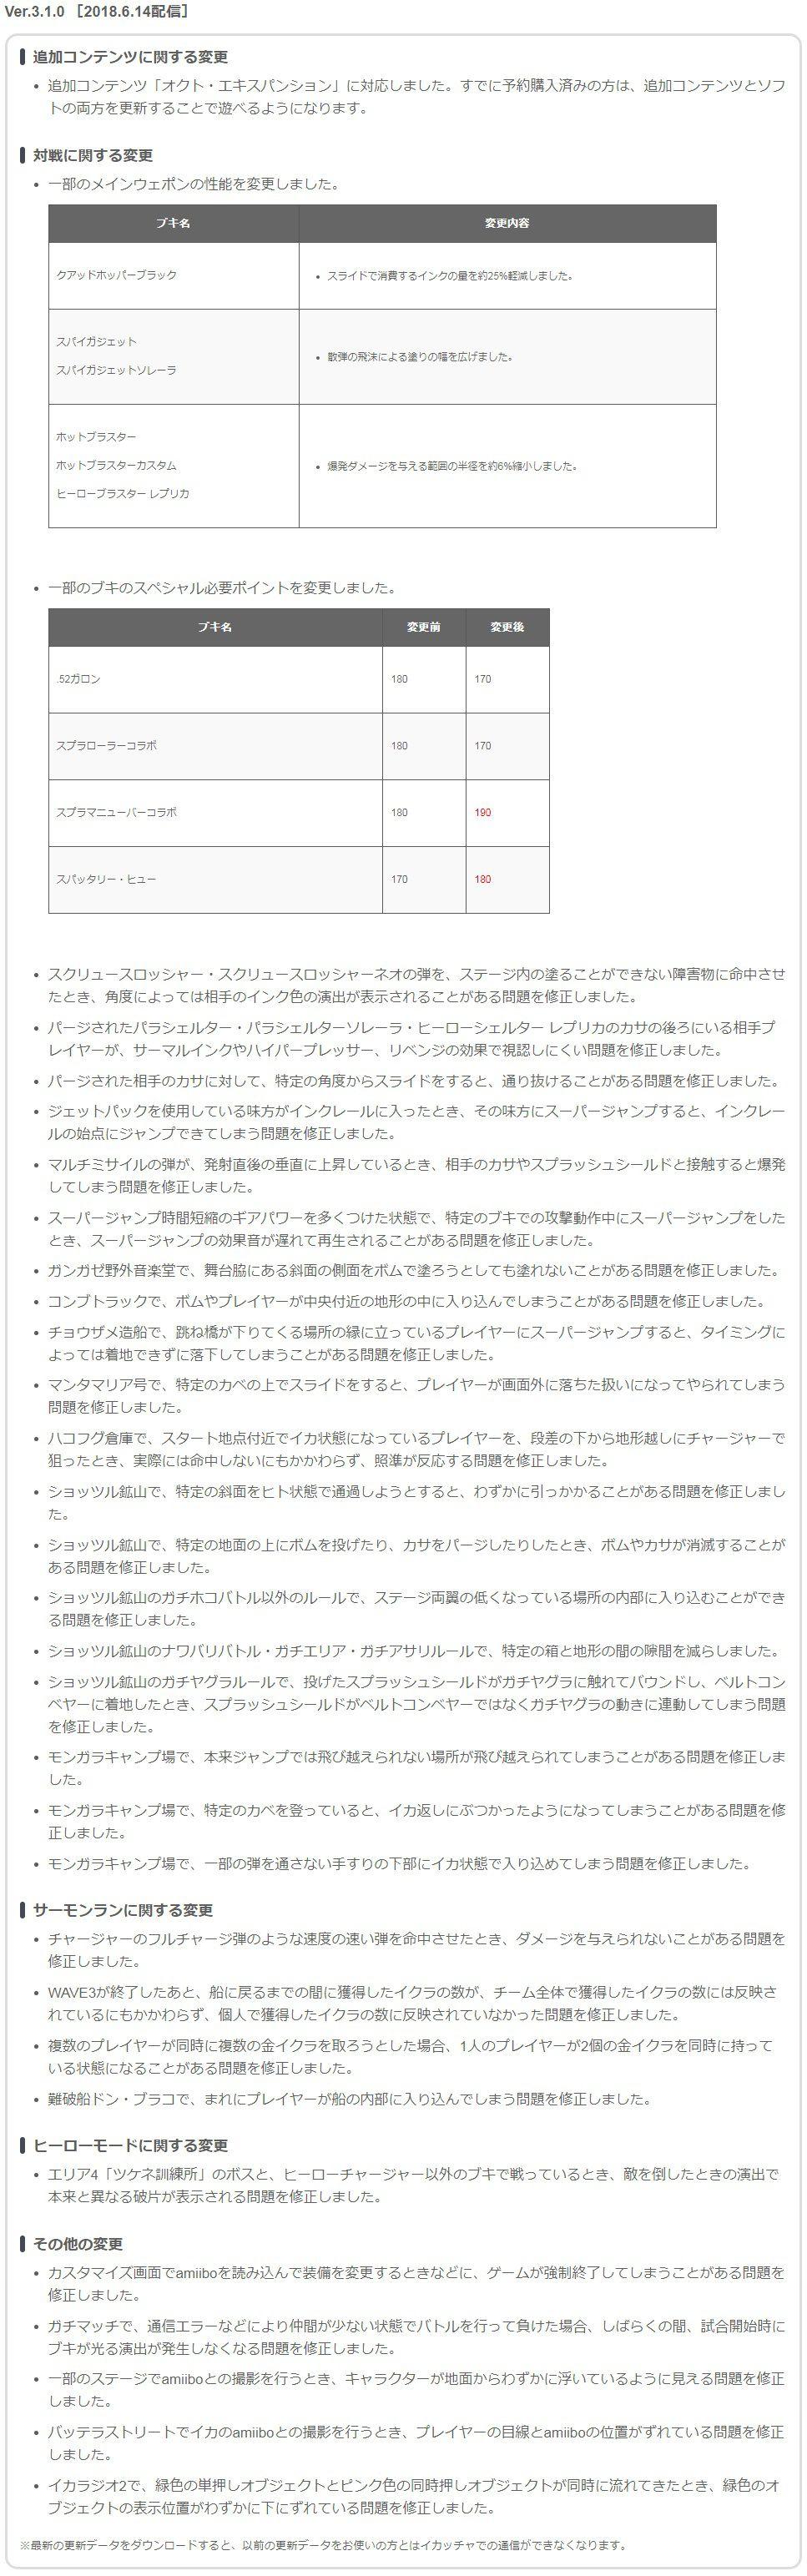 image_11409.jpg